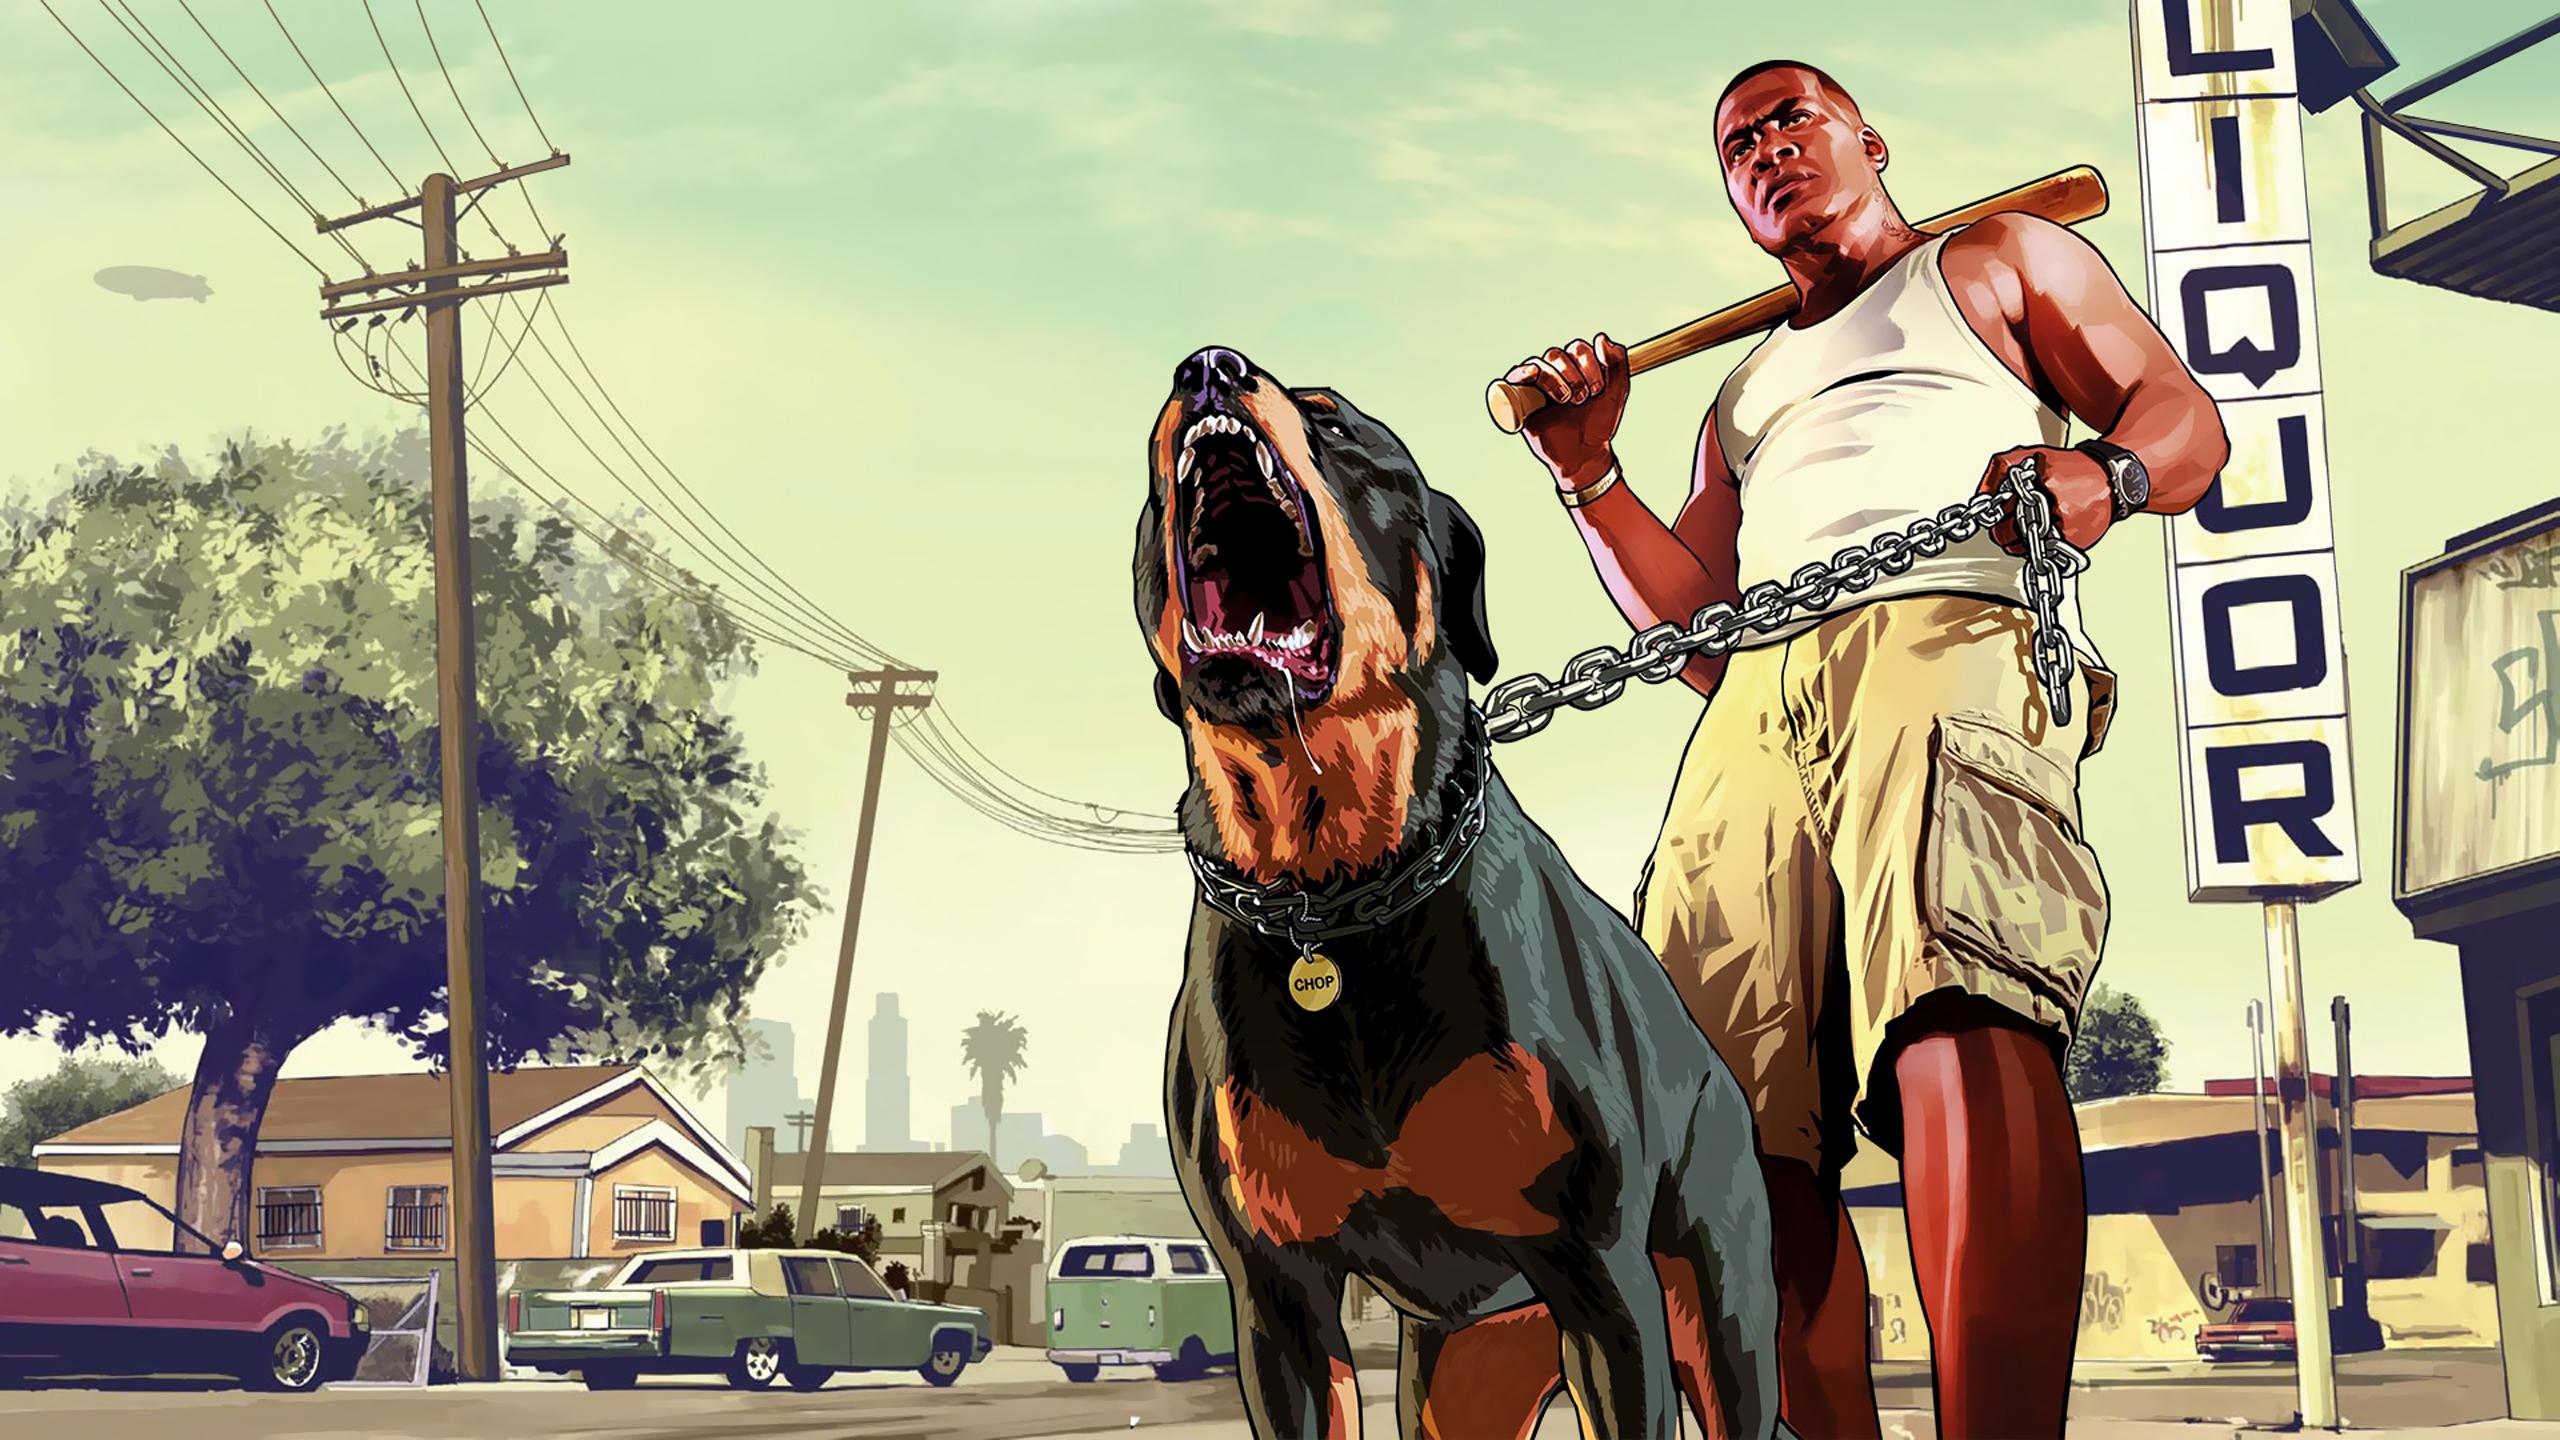 Grand Theft Auto 5 Geekstroke 2560x1440